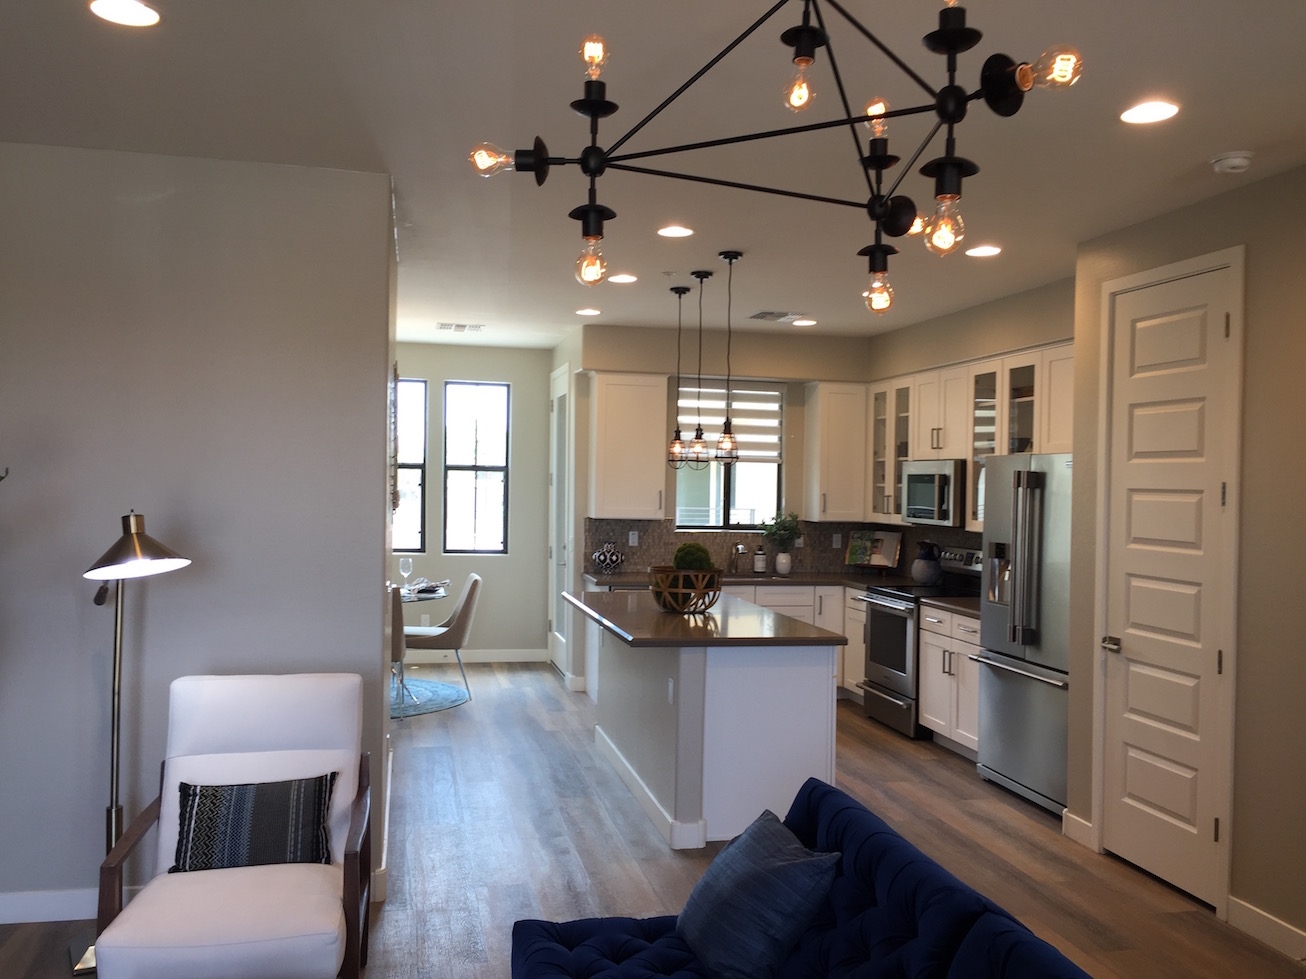 Biltmore Living condo in Phoenix